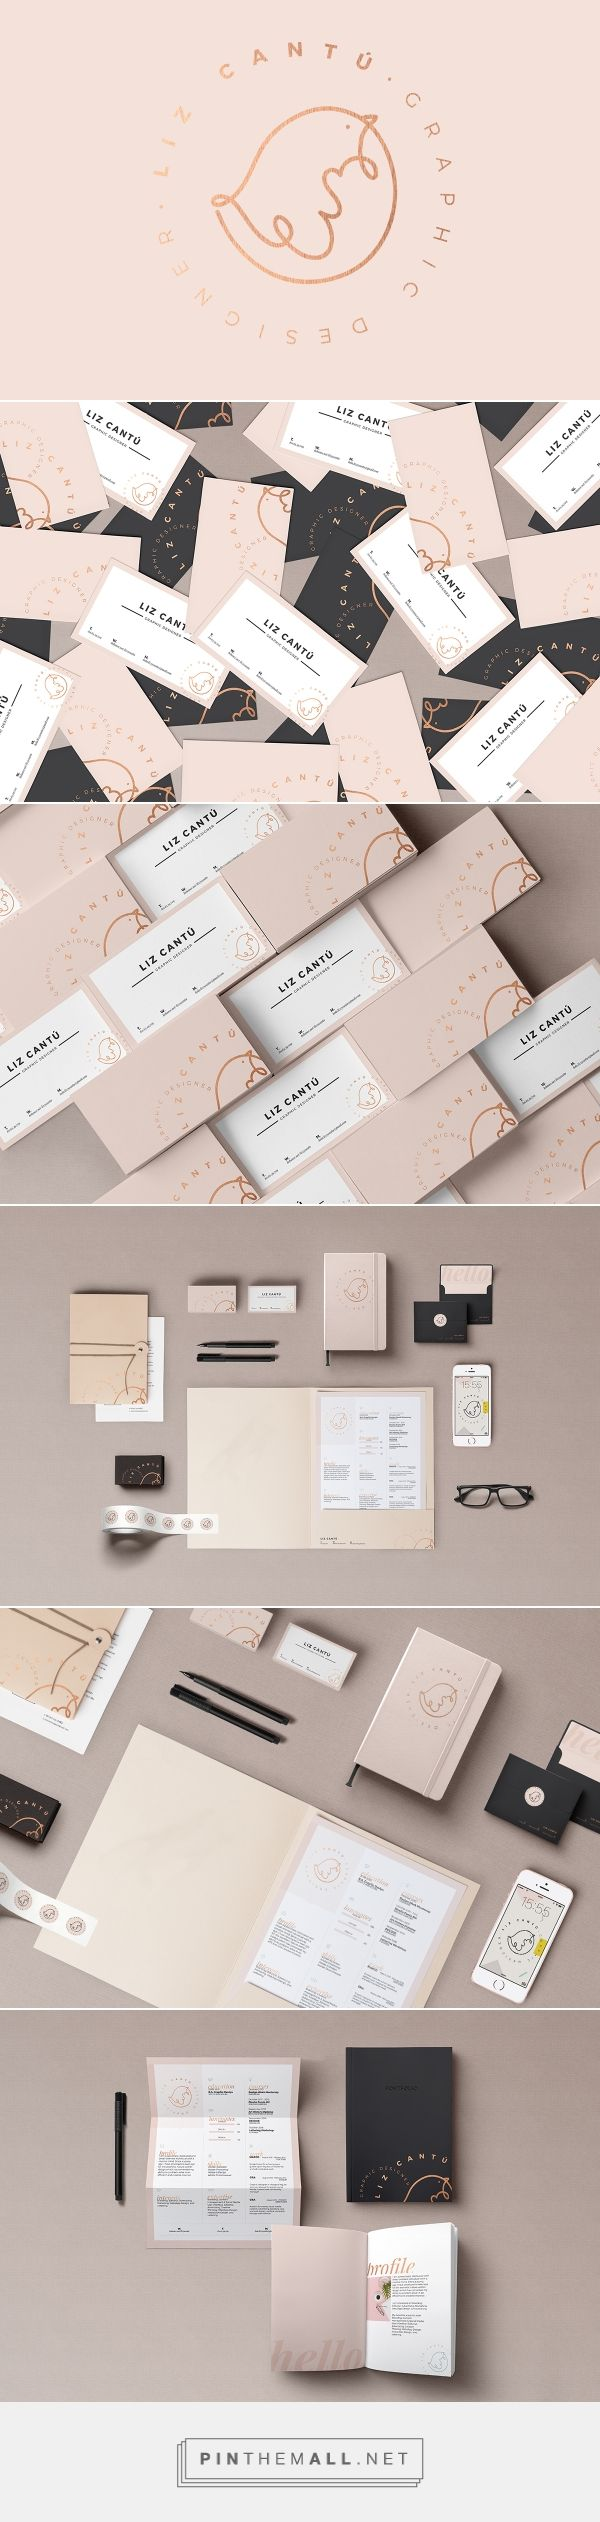 Lizzy Cantu Self Branding on Behance | Fivestar Branding – Design and Branding Agency & Inspiration Gallery